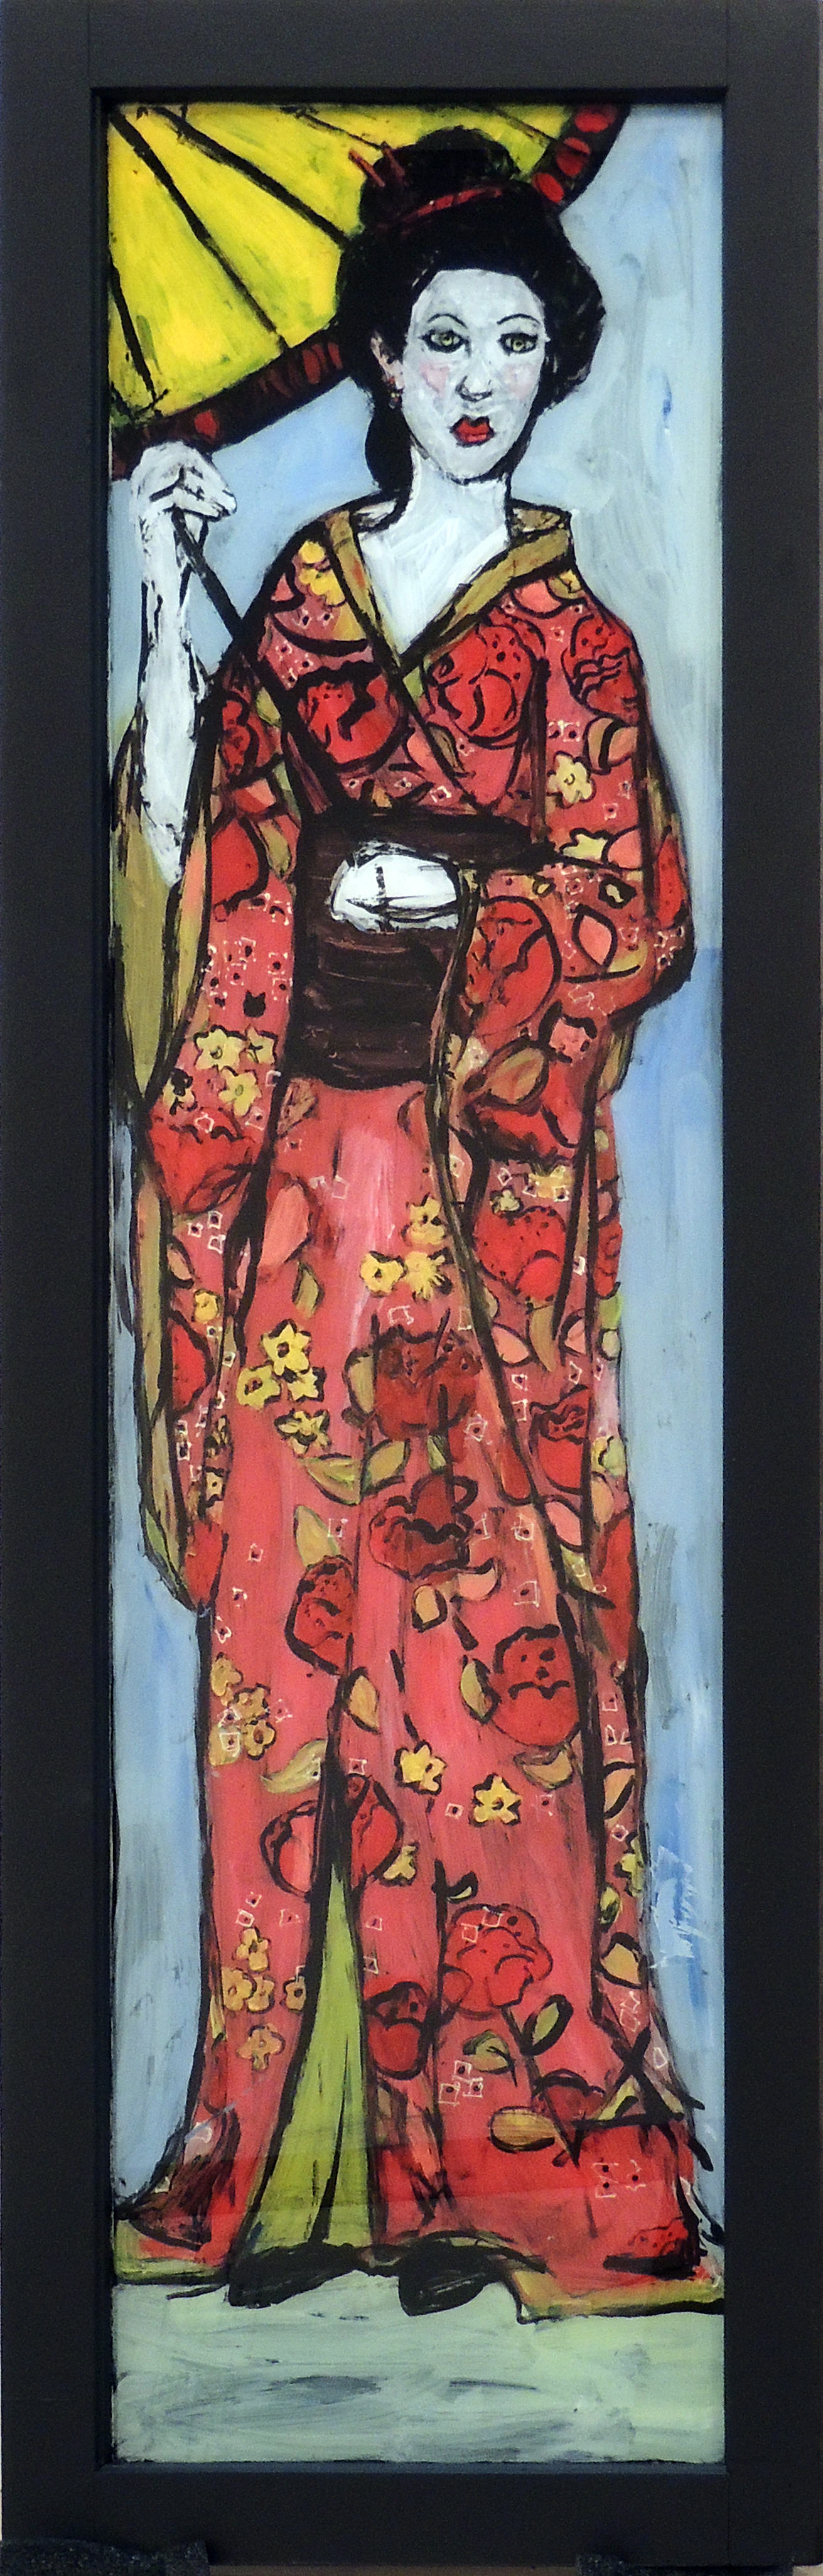 Jennifer O'Brien | LADY WITH PARASOL | Acrylic on glass